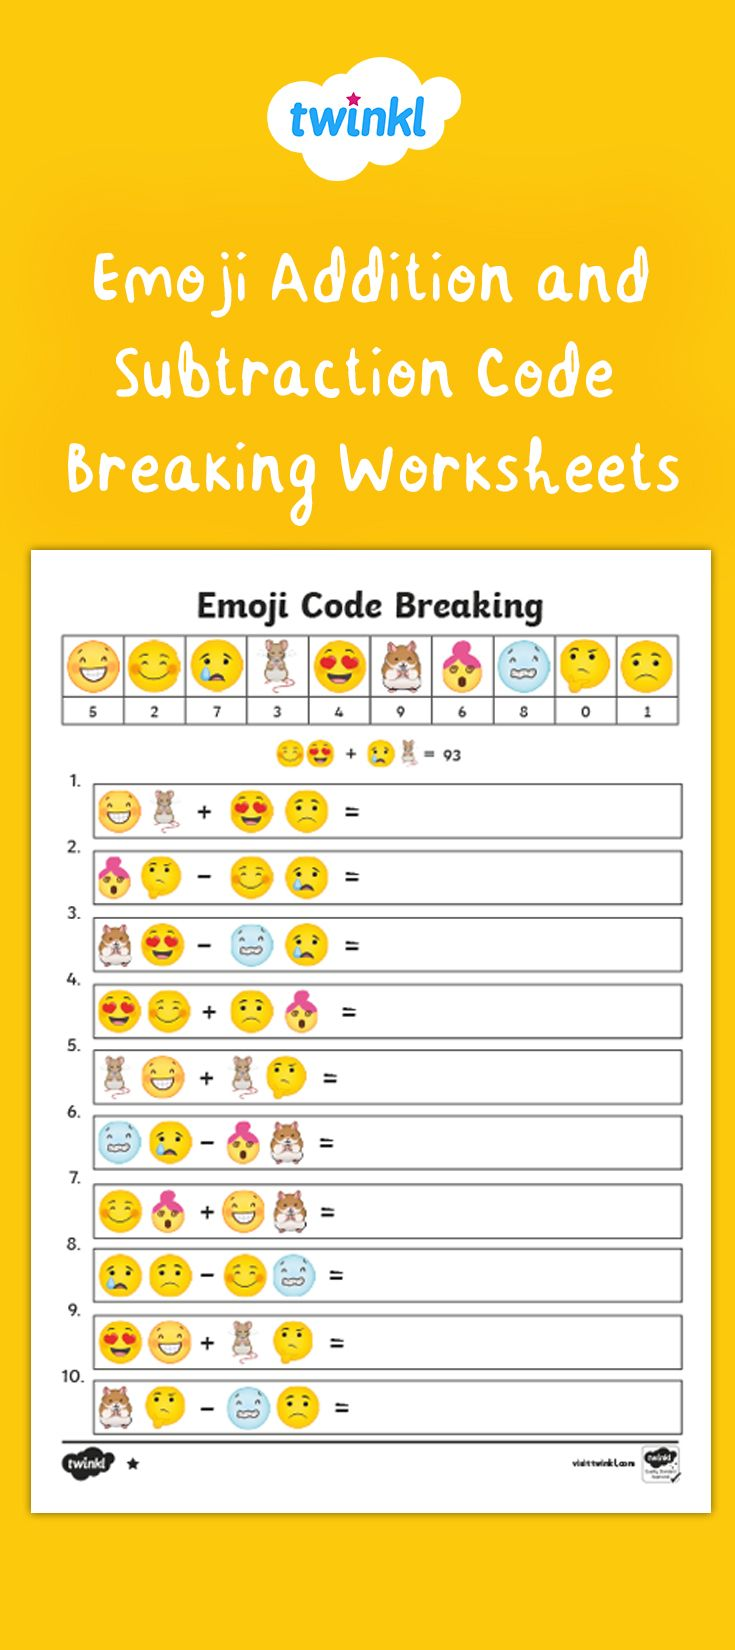 Emoji Maths Code Breaking Worksheets Ks2 Emoji Math Emoji Codes Addition And Subtraction Year addition worksheets twinkl